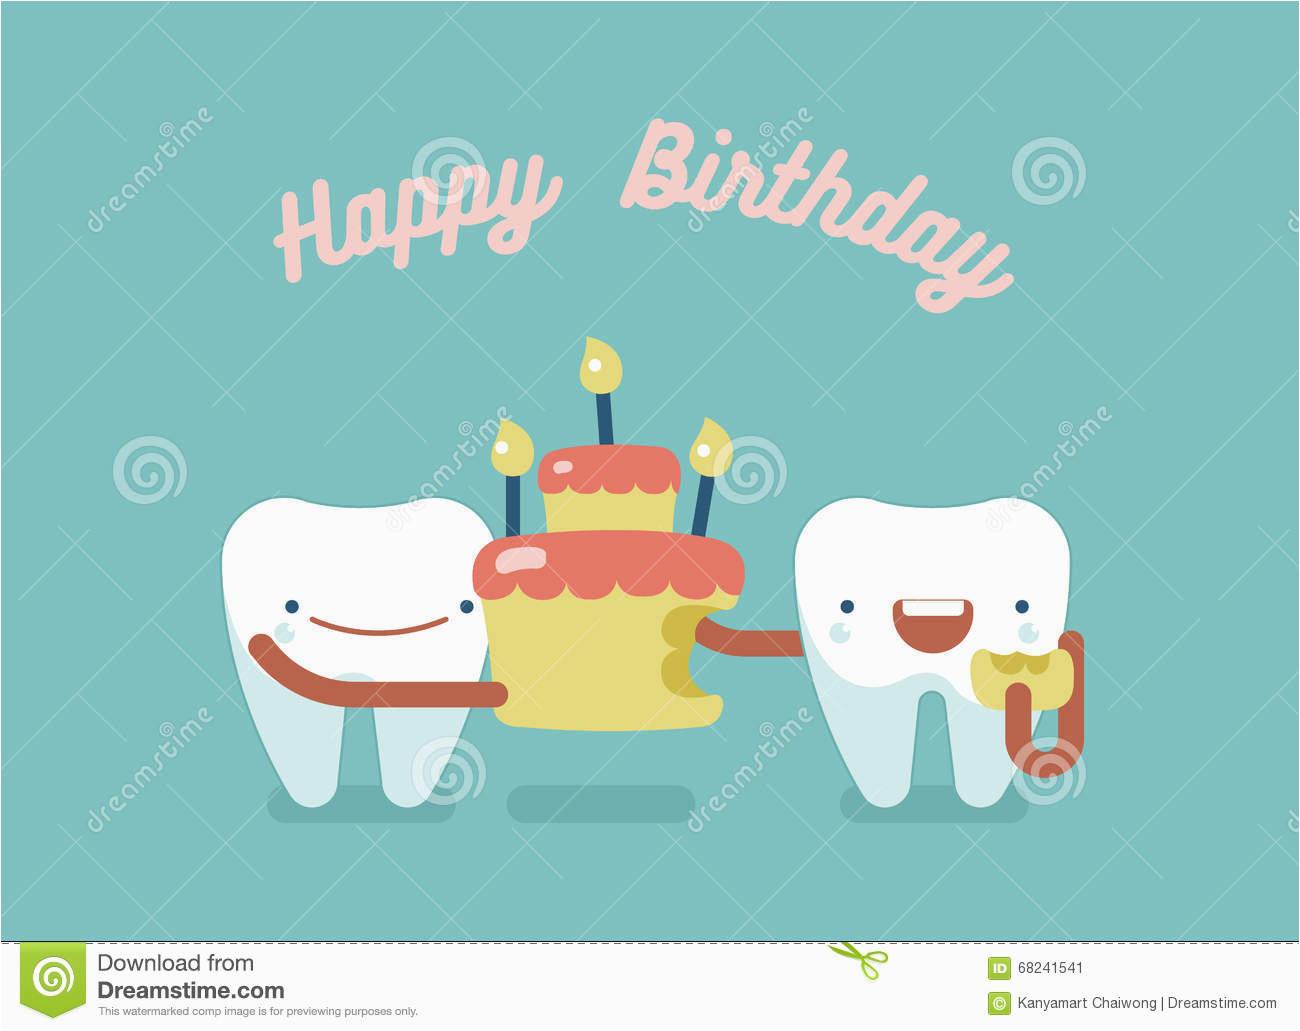 stock illustration happy birthday dental concept design image68241541